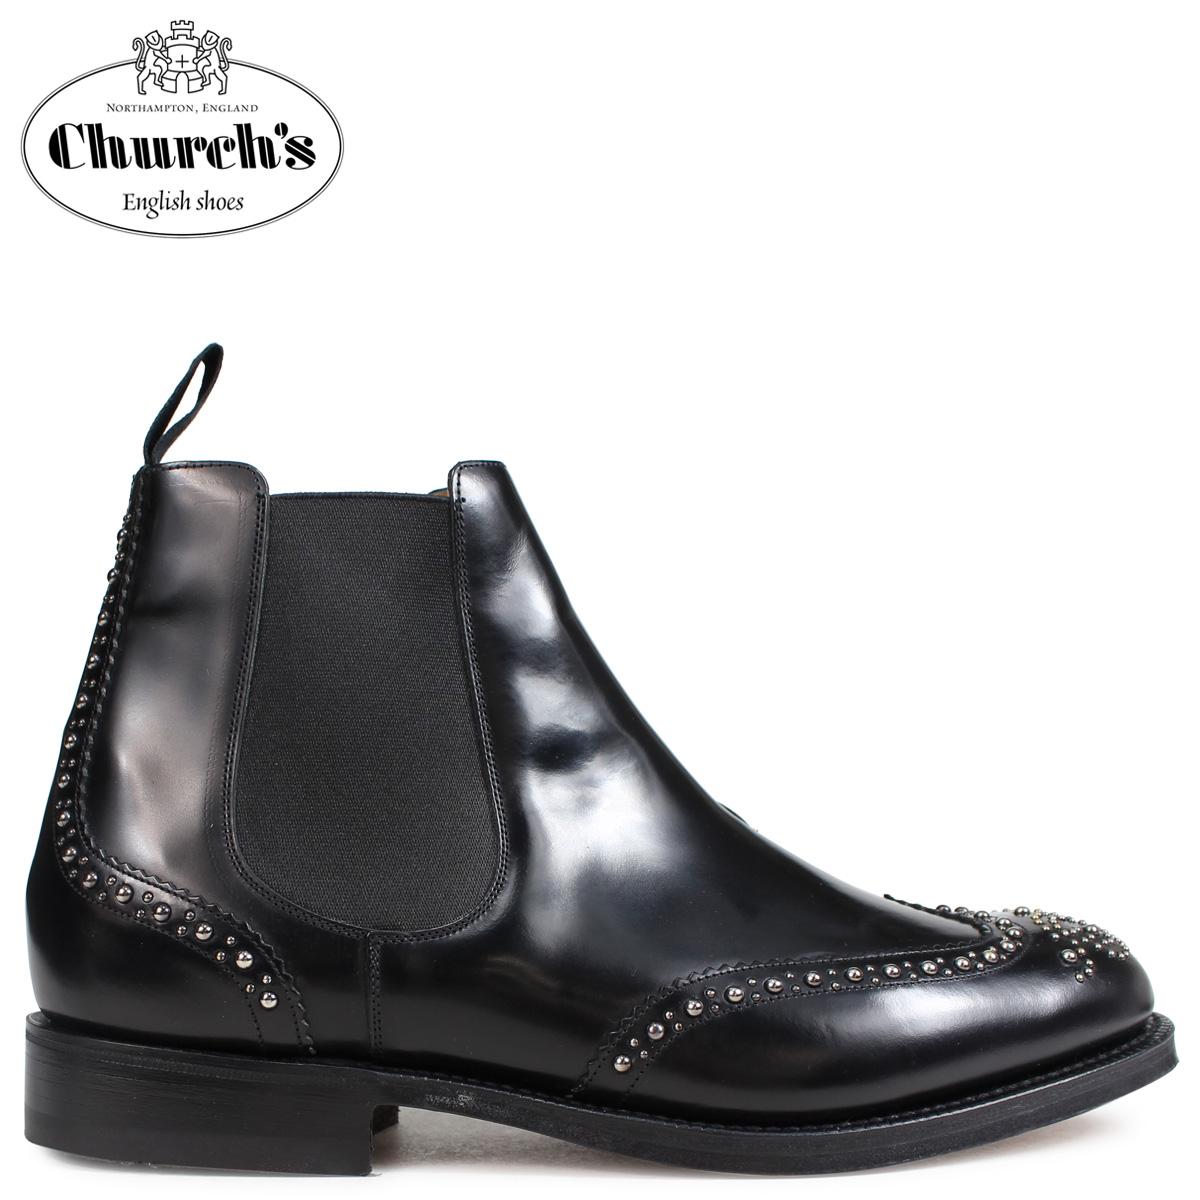 Churchs チャーチ 靴 ケッツビー 81 ブーツ サイドゴア ショートブーツ メンズ KETSBY 81 MET POLISHED BINDER ETB009 ブラック 黒